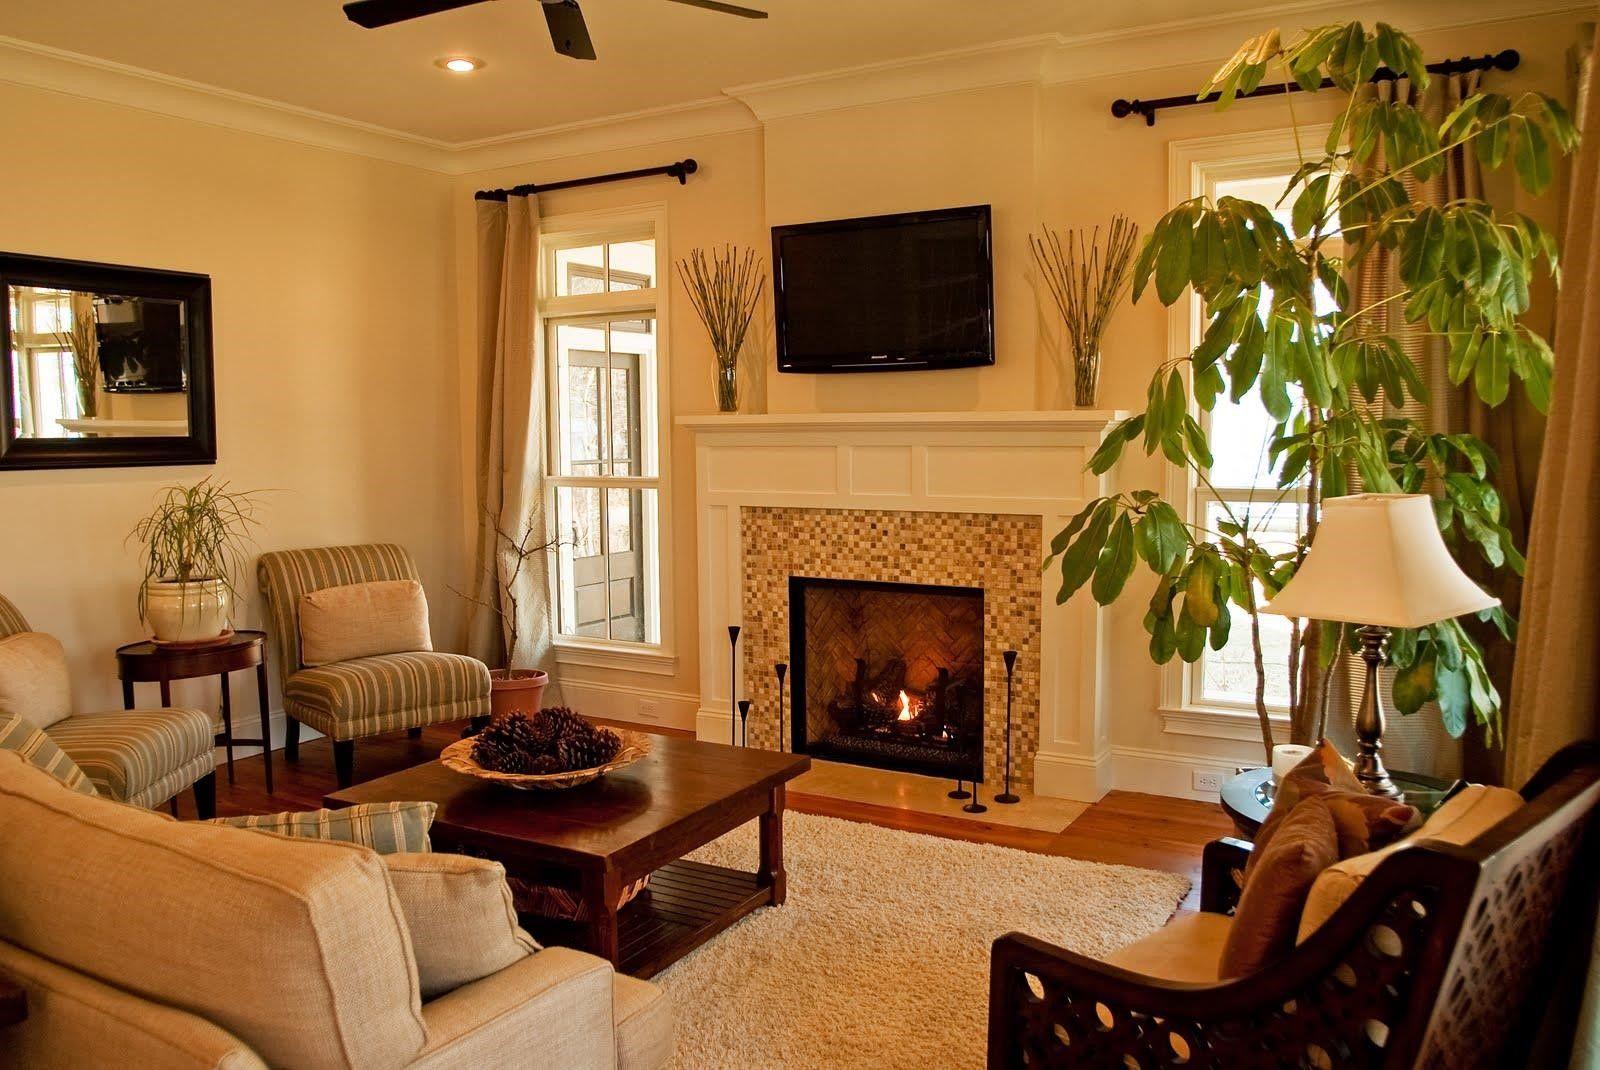 Corner Designs For Living Room Beauteous Corner Of Living Room Ideas  Small Living Room Ideas With Corner Design Ideas